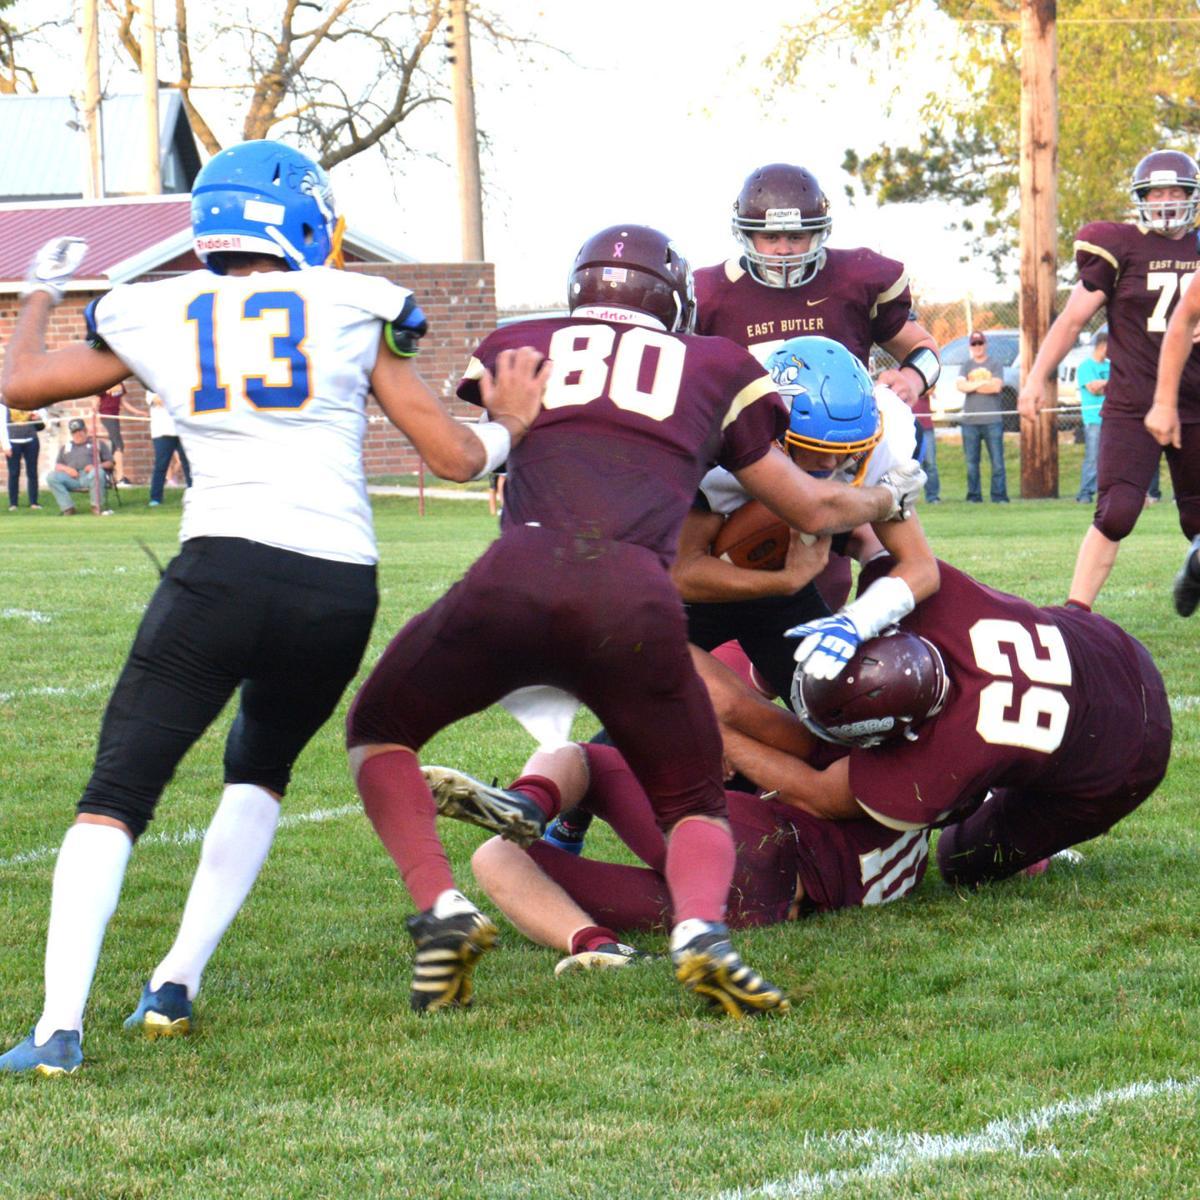 East Butler tacklers